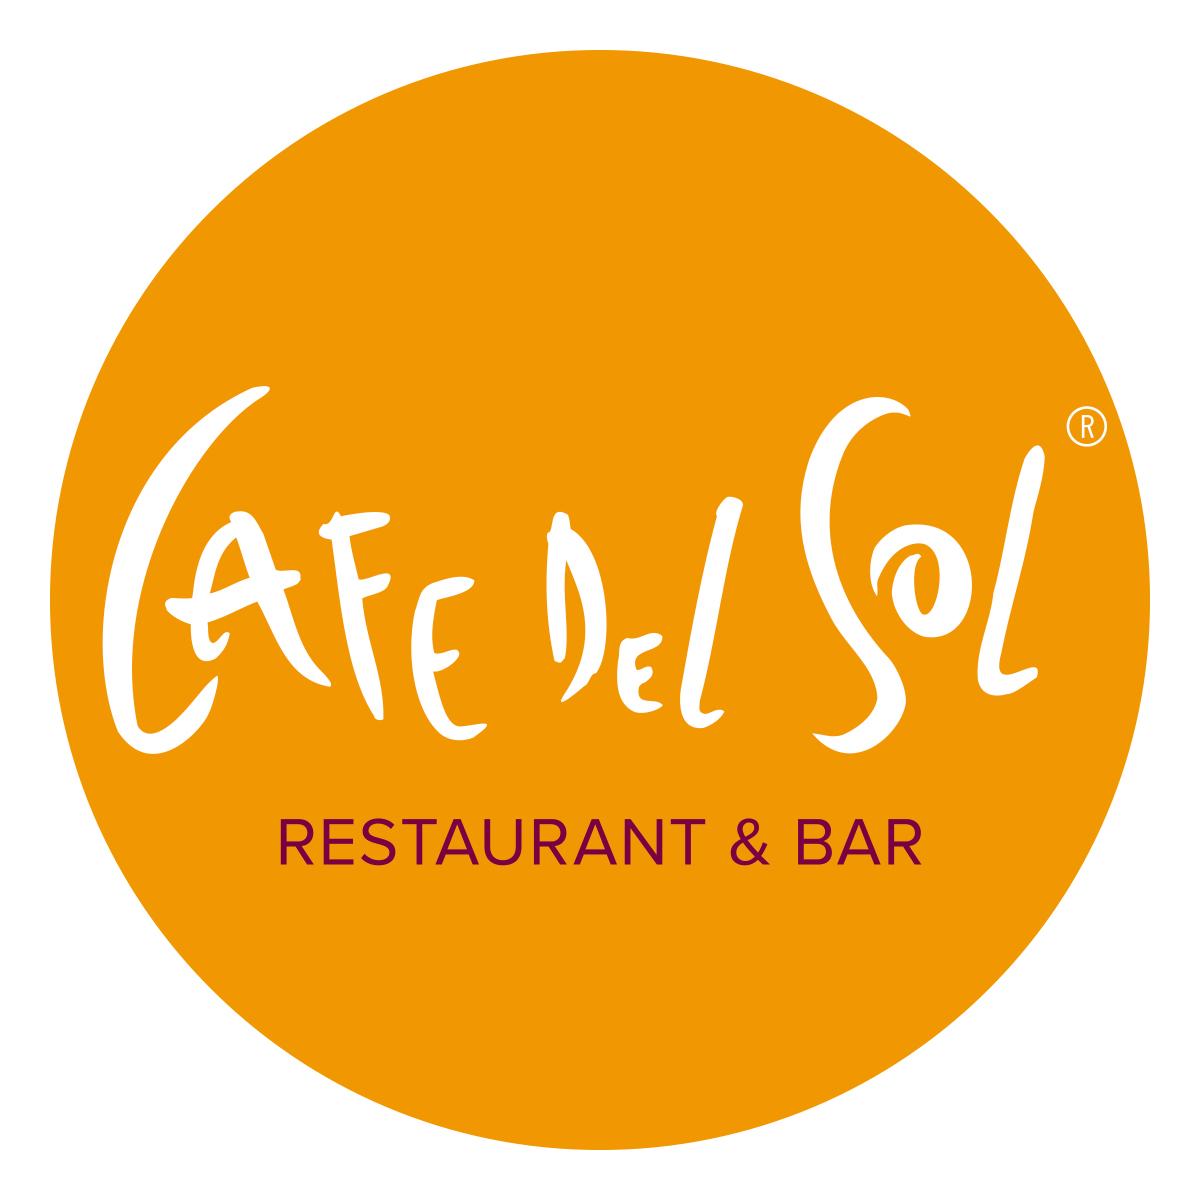 Cafe Del Sol Hildesheim